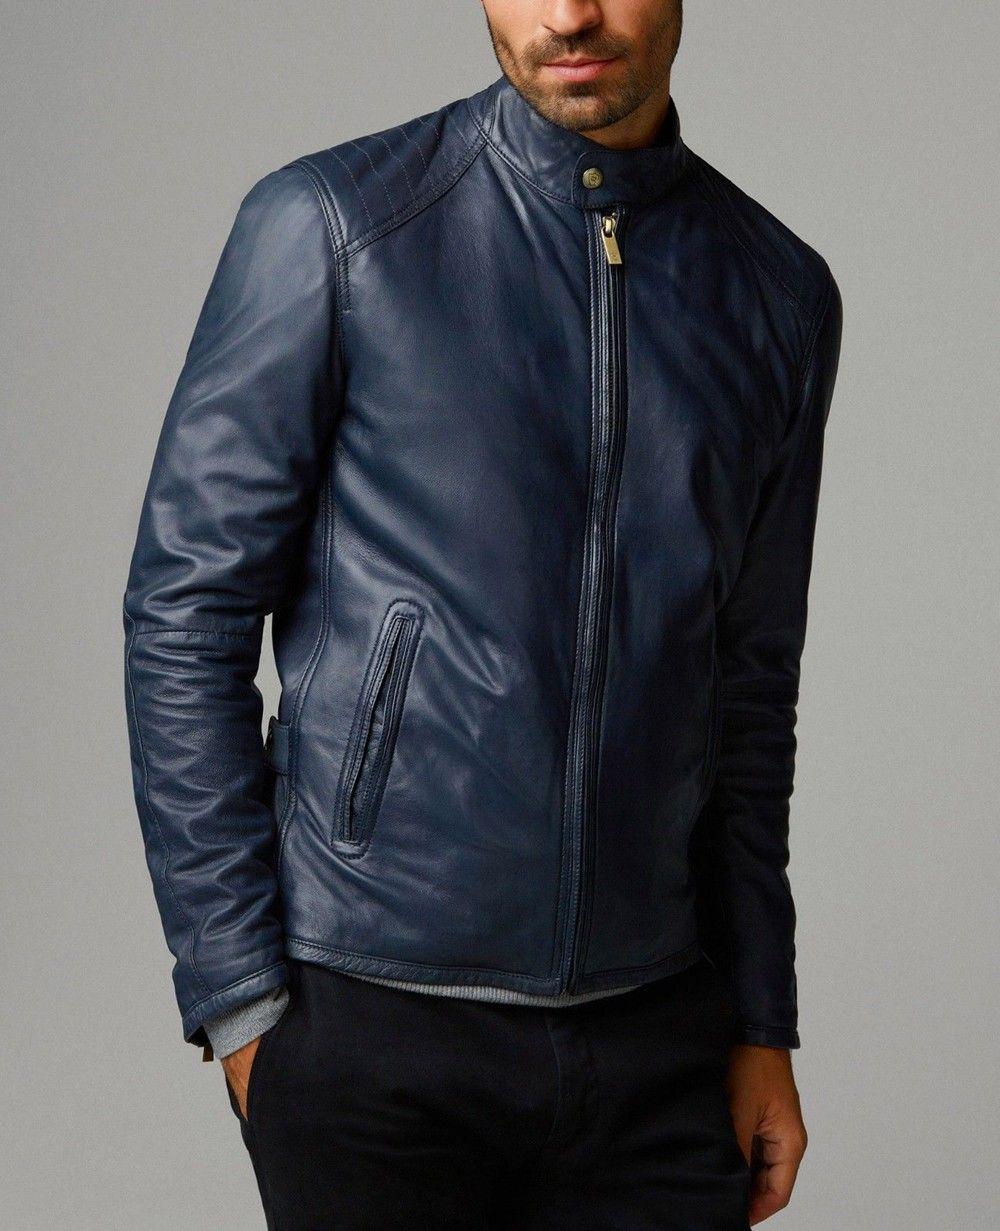 Navy Blue Leather Jacket For Men R1 2278 Men Fashion Leather